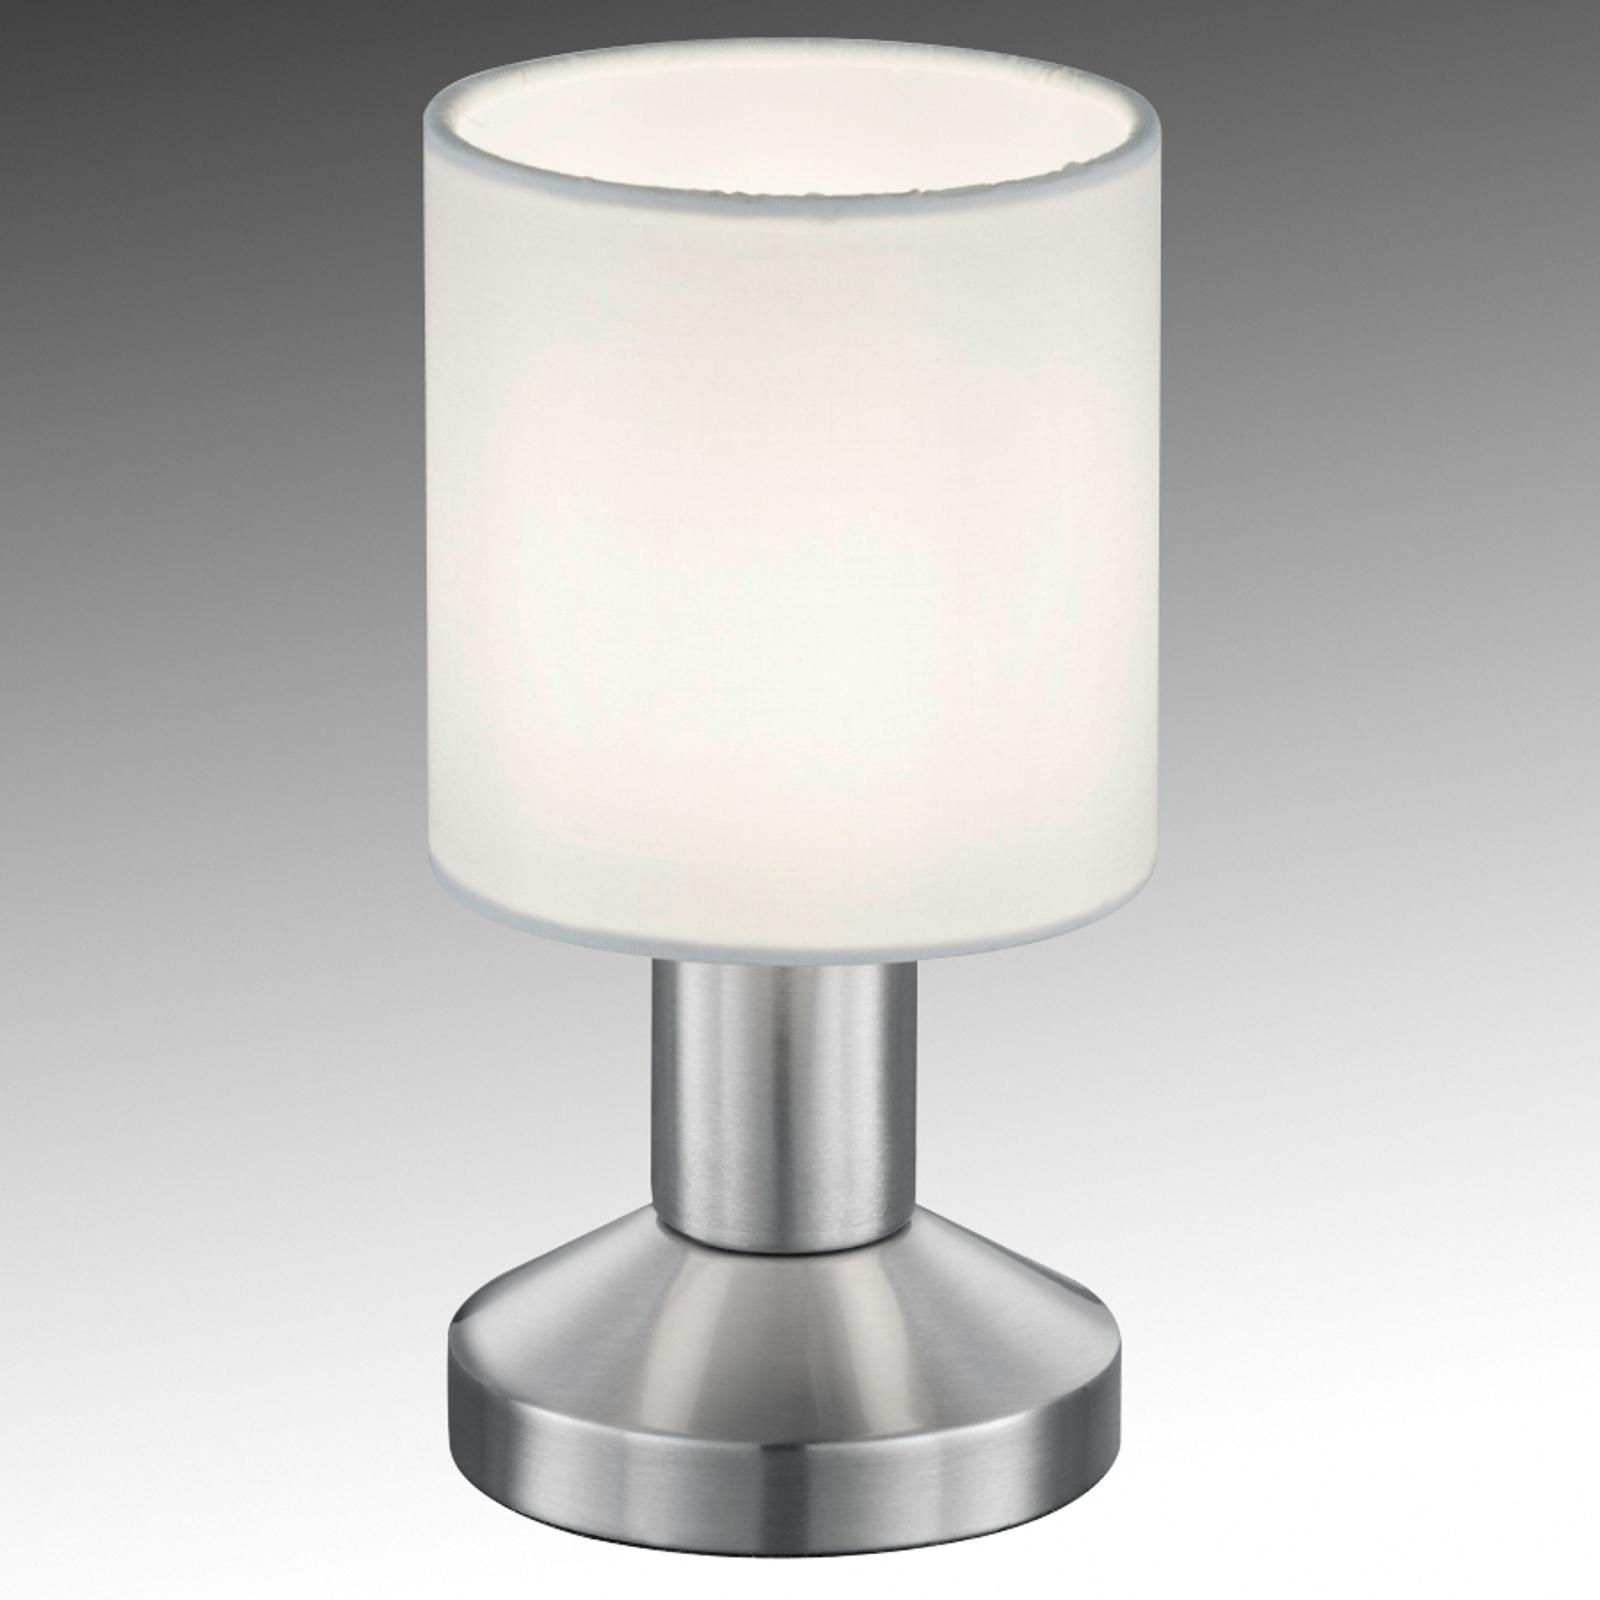 Lampe à poser Garda avec un abat-jour tissu blanc